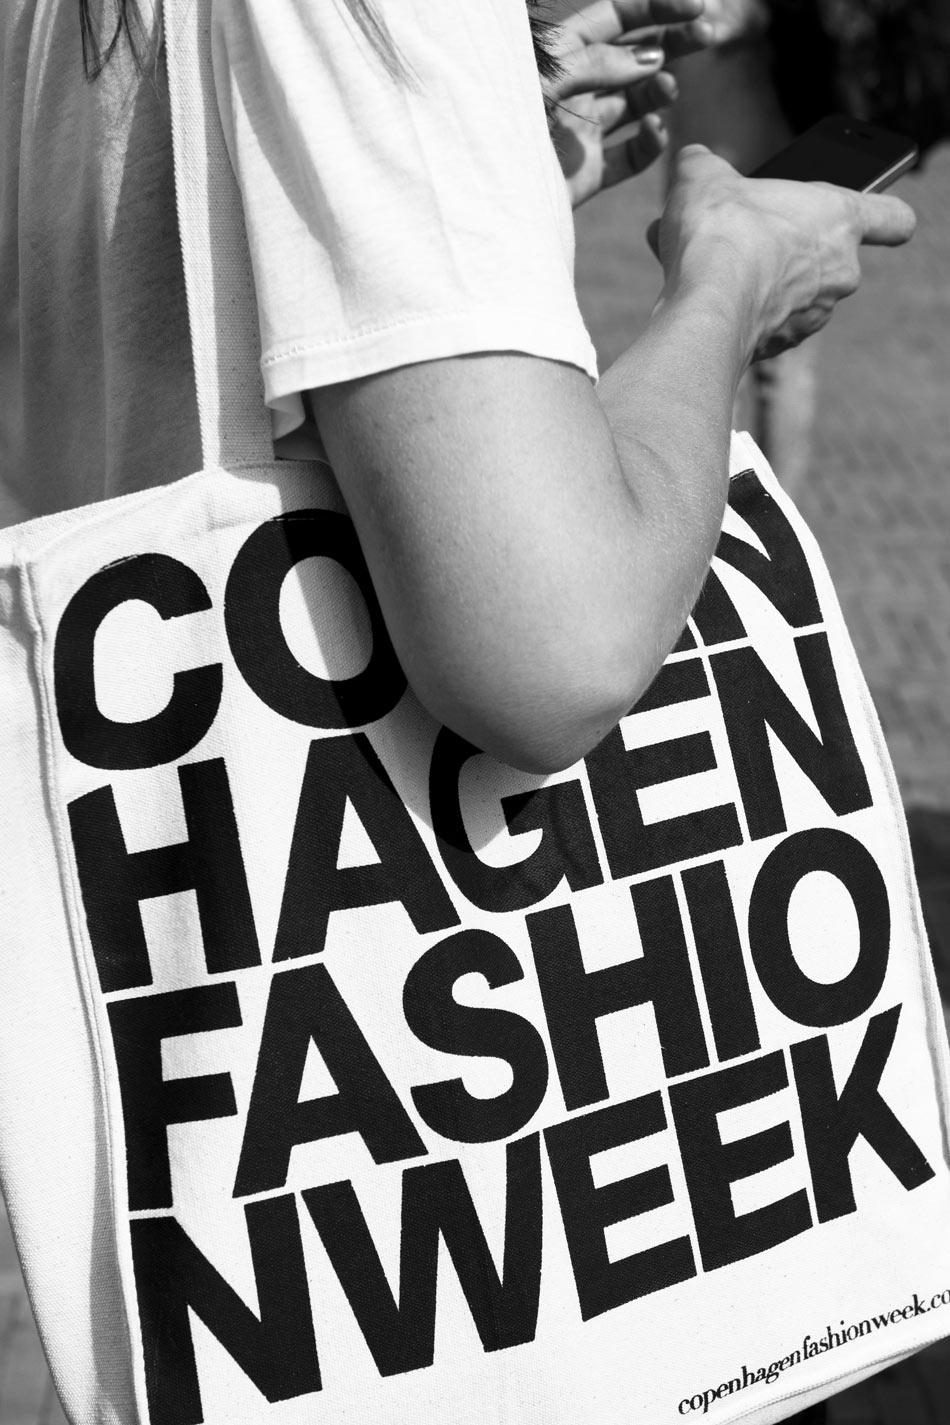 Copenhagen Fashion Week Fall/Winter 2017 Schedule Announced